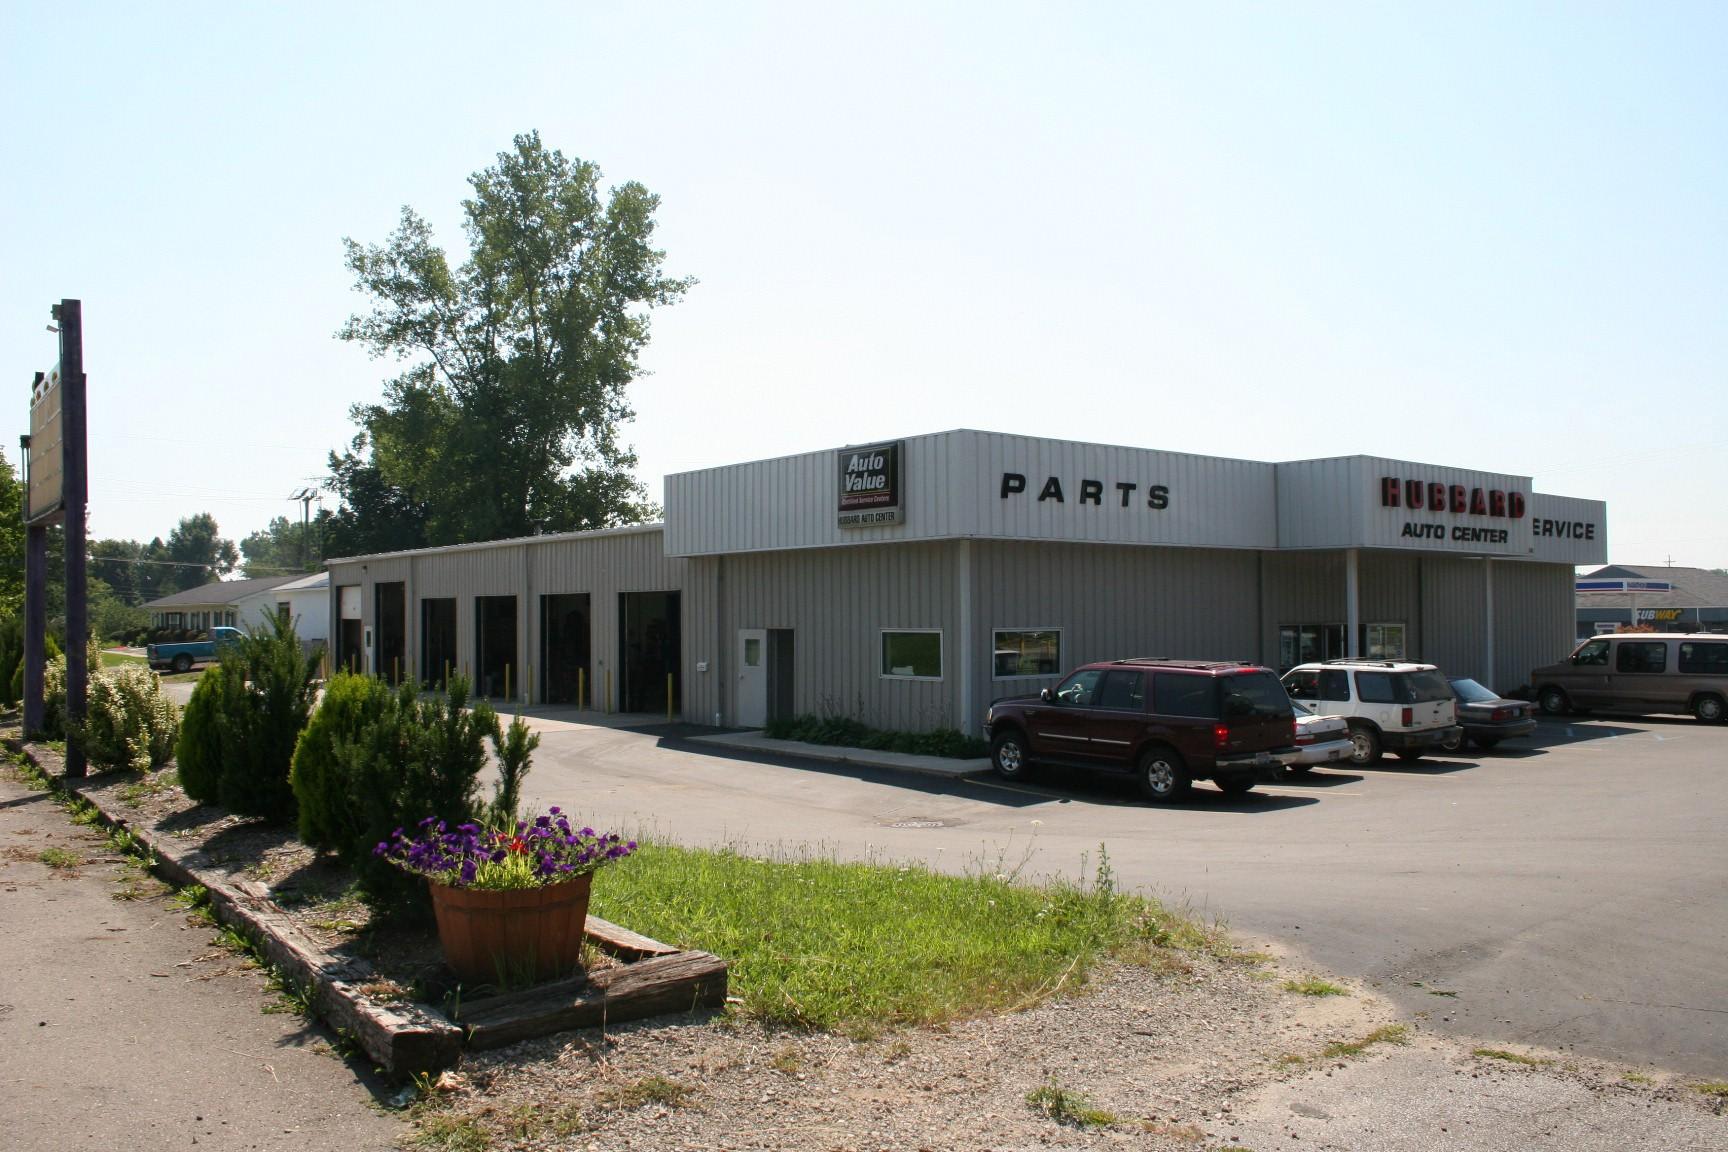 Hubbard Auto Center